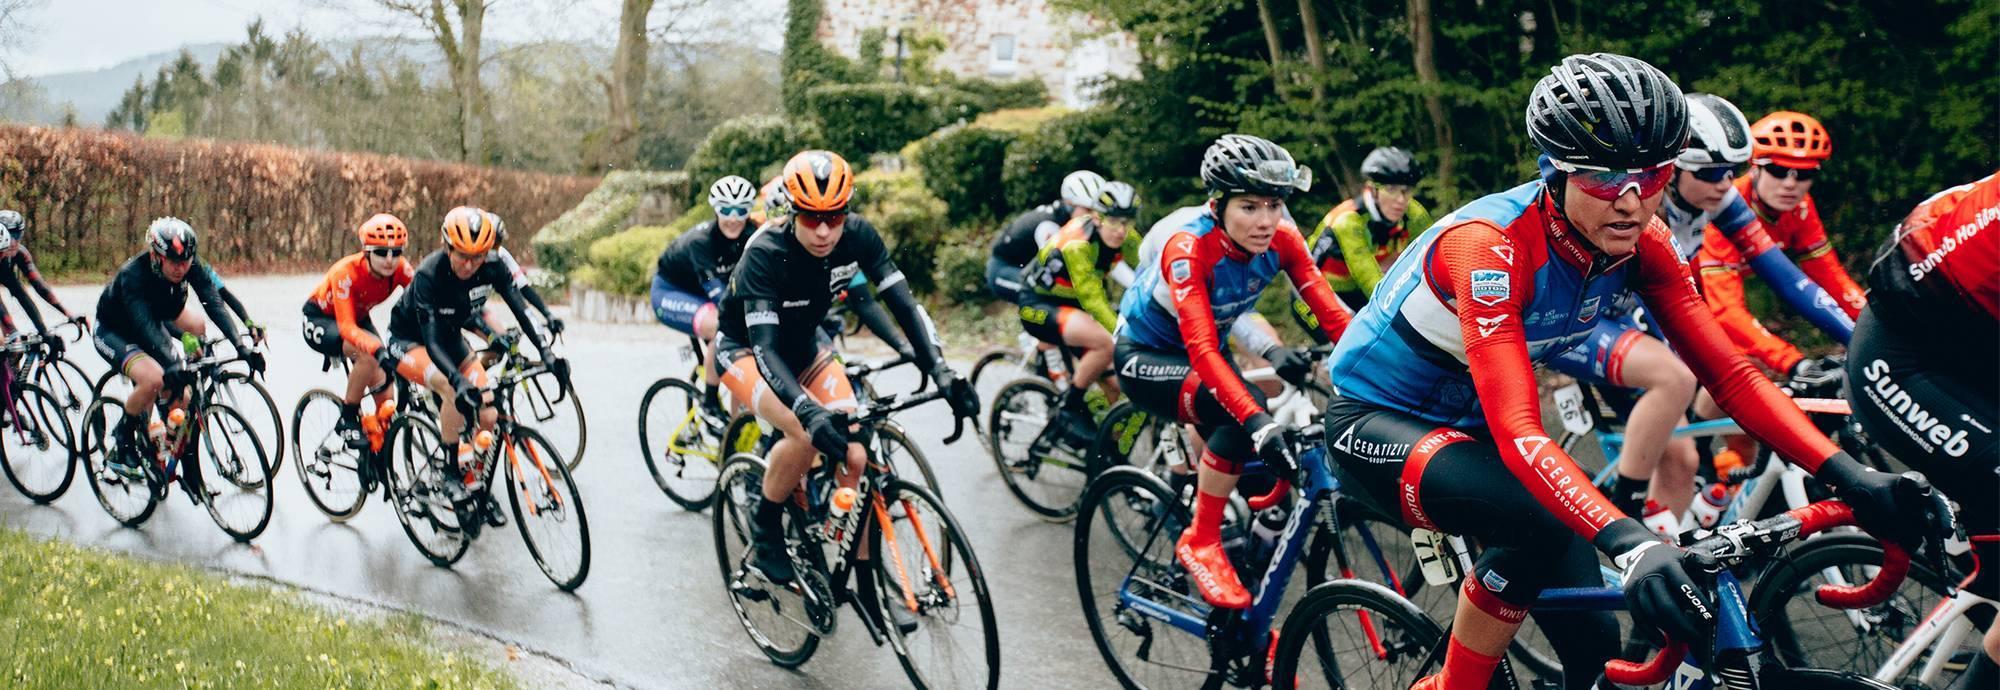 Header: CERATIZIT - WNT PRO CYCLING TEAM